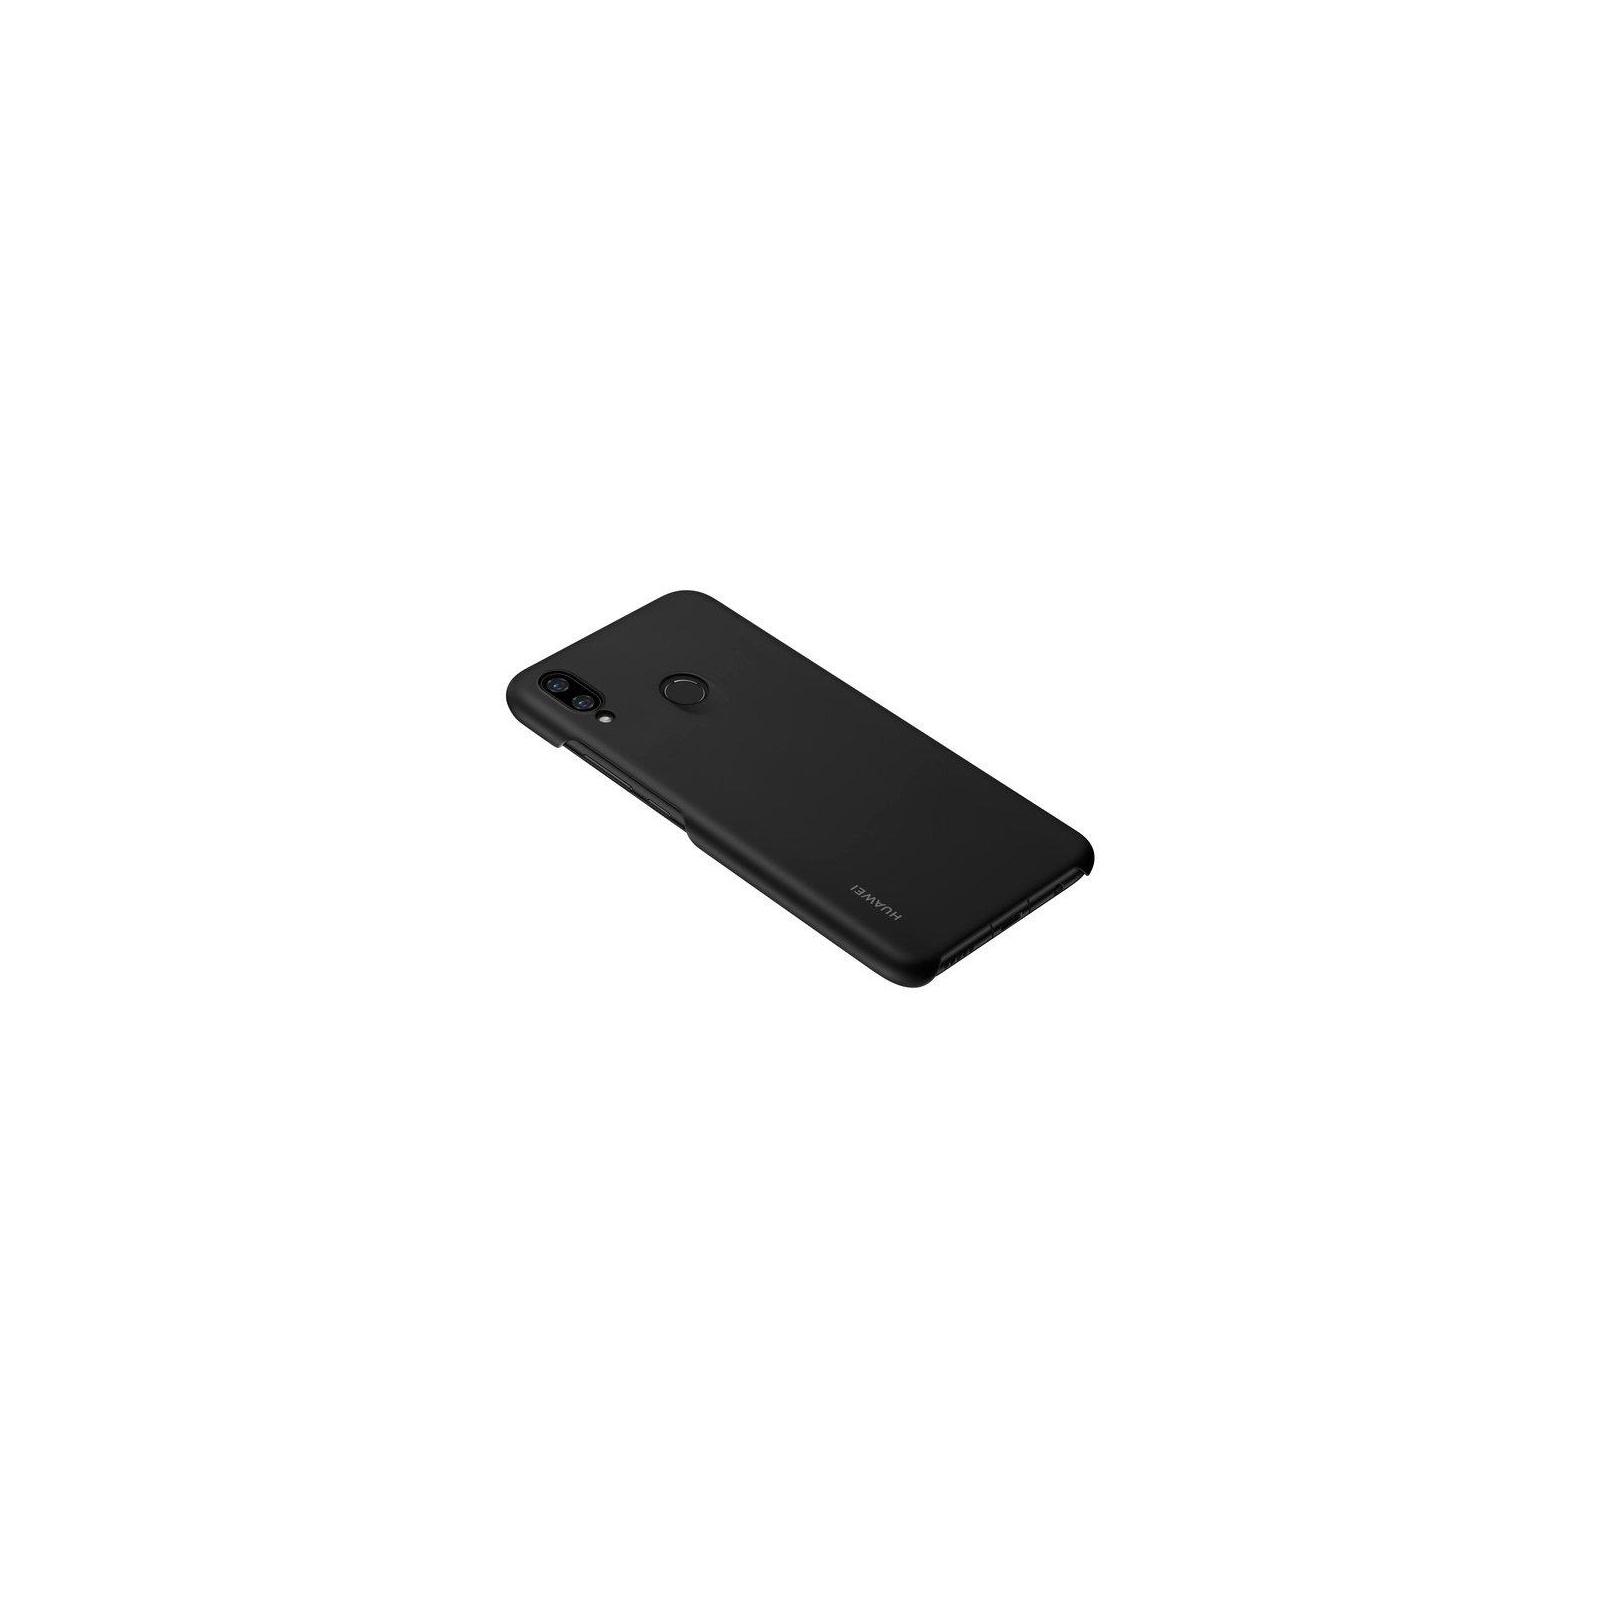 Чехол для моб. телефона Huawei для Huawei P Smart+ Magic Case black (51992698) изображение 3